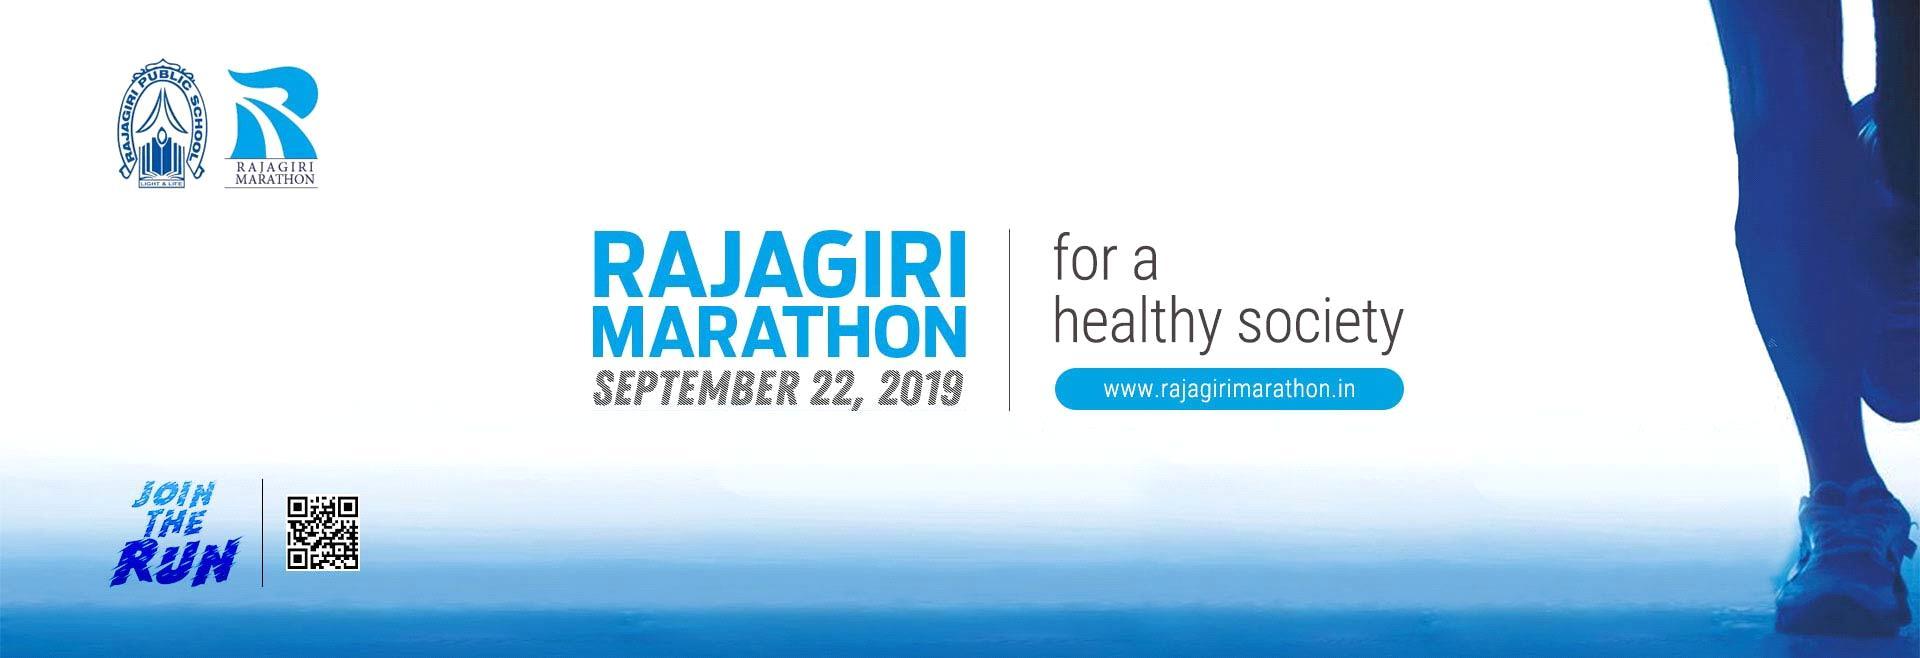 Rajagiri Marathon